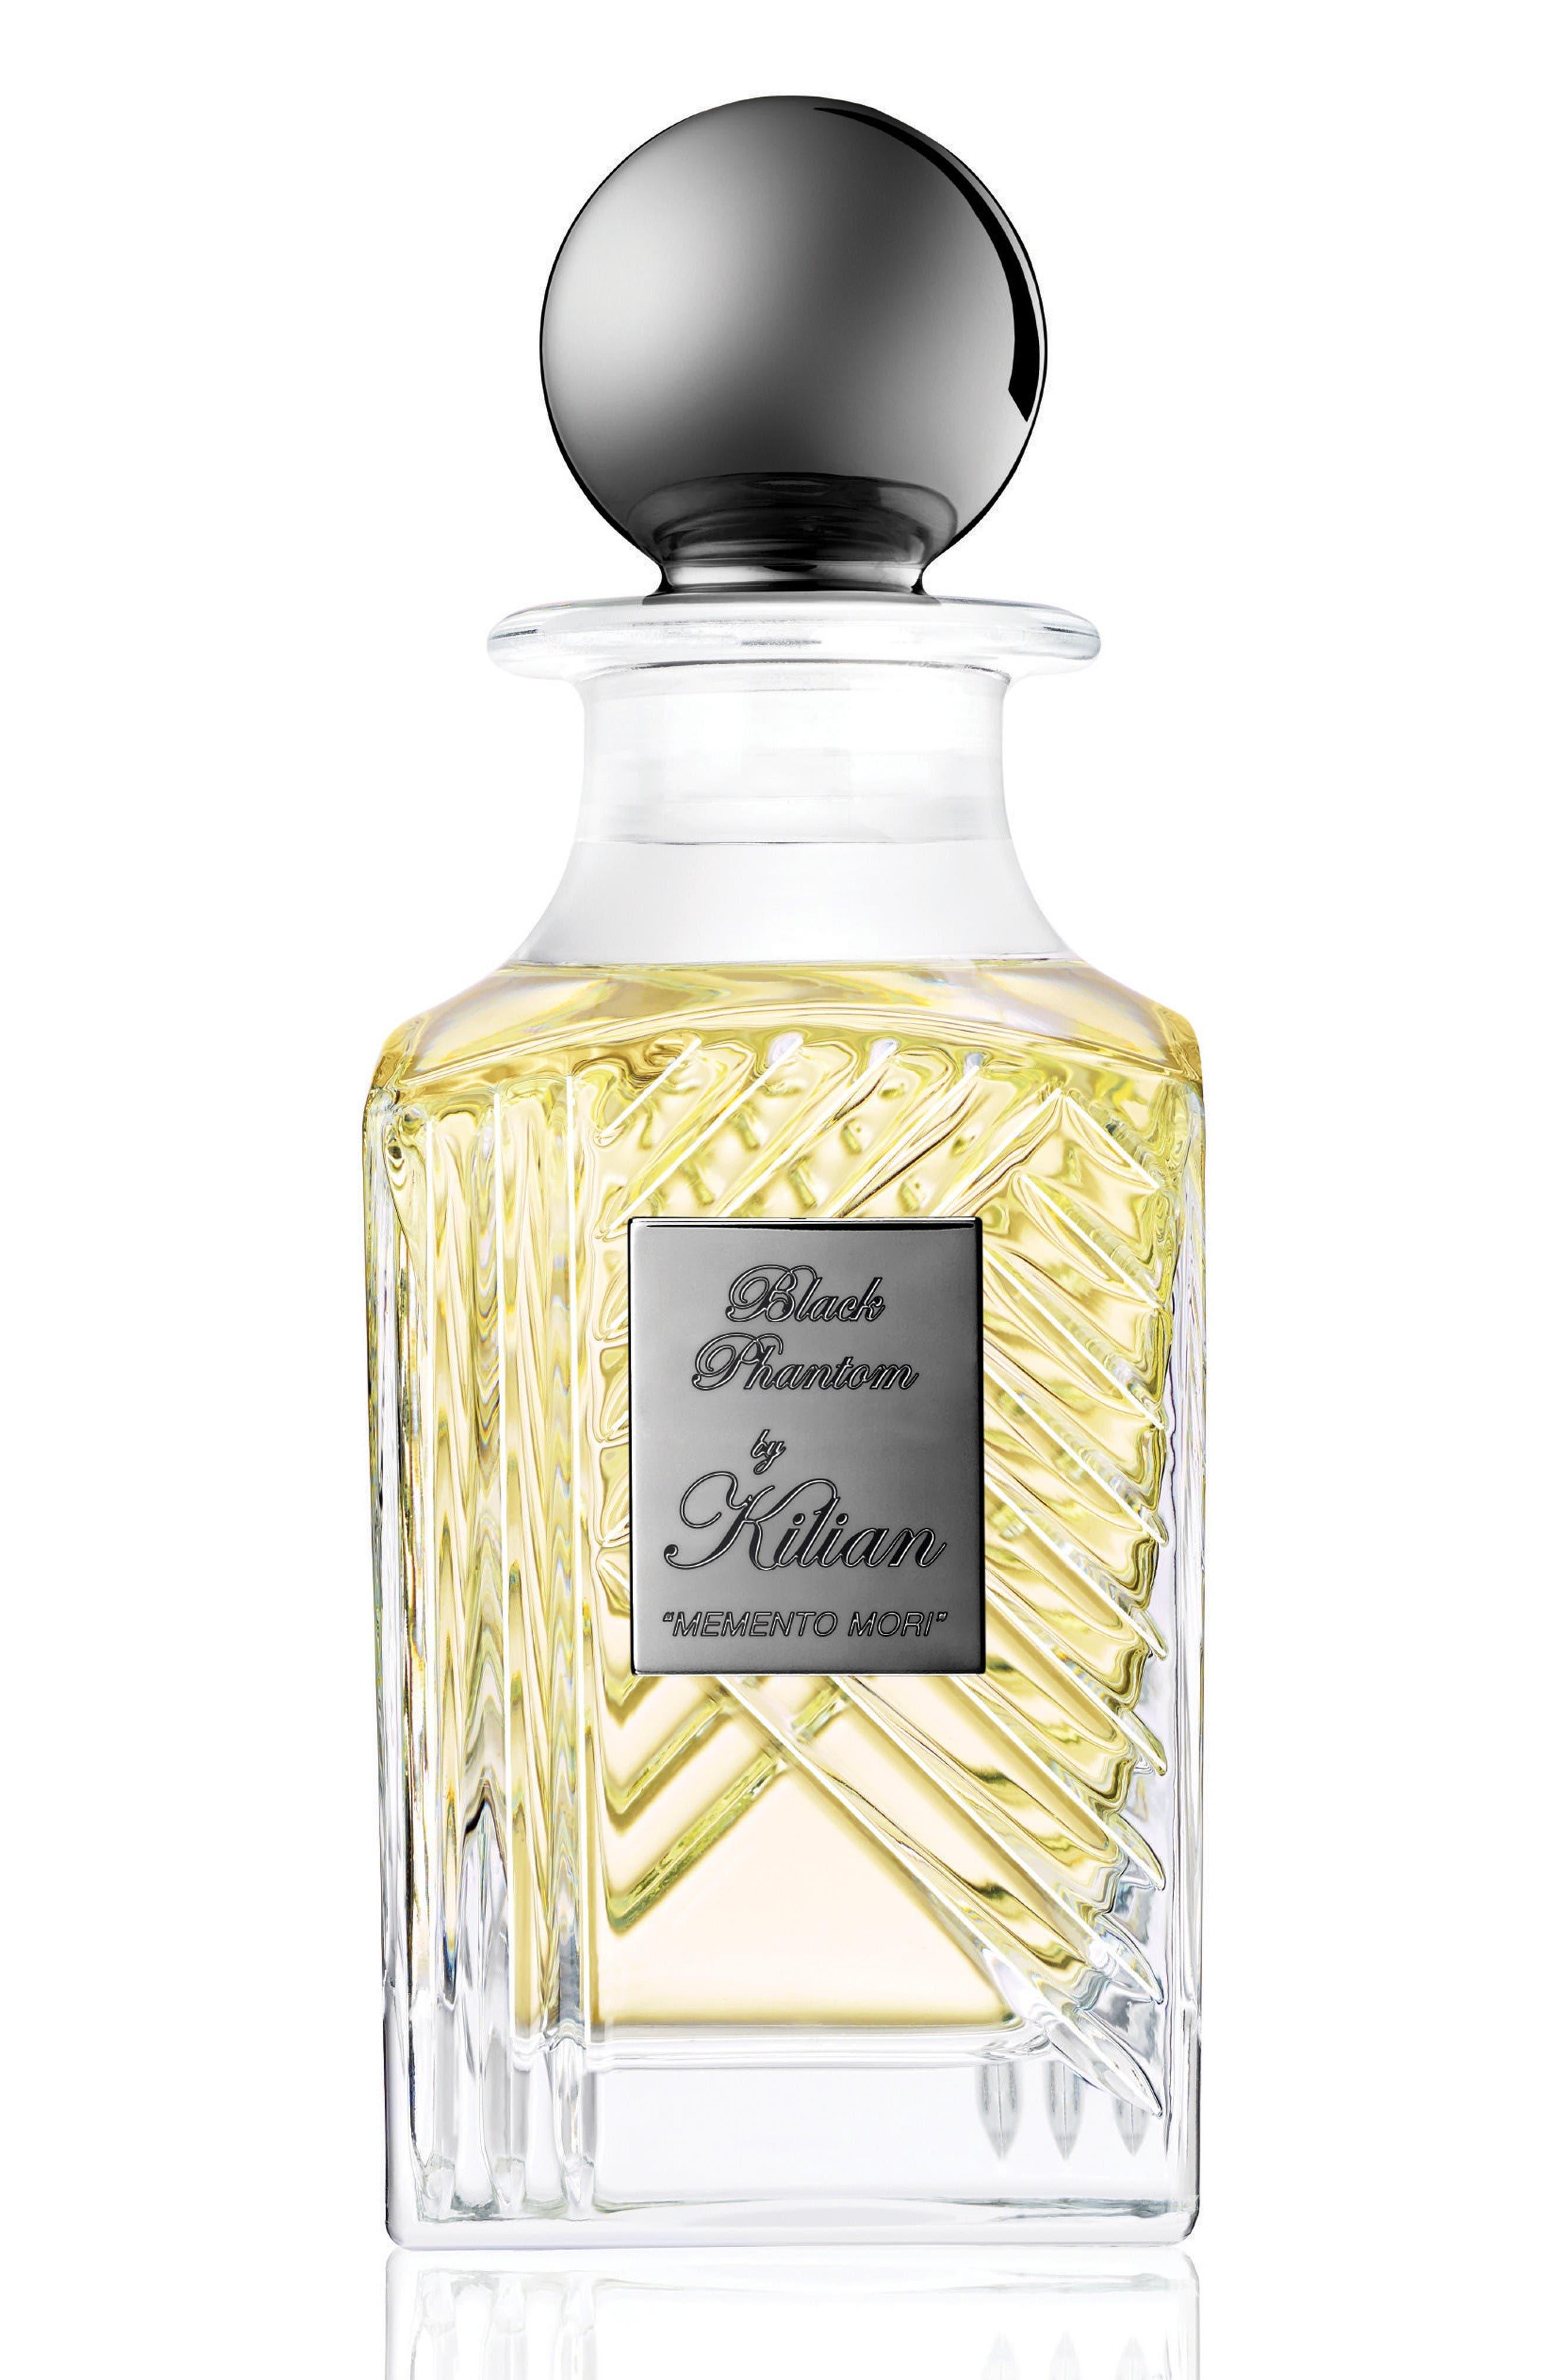 Alternate Image 1 Selected - Kilian Black Phantom Memento Mori Eau de Parfum Mini Carafe